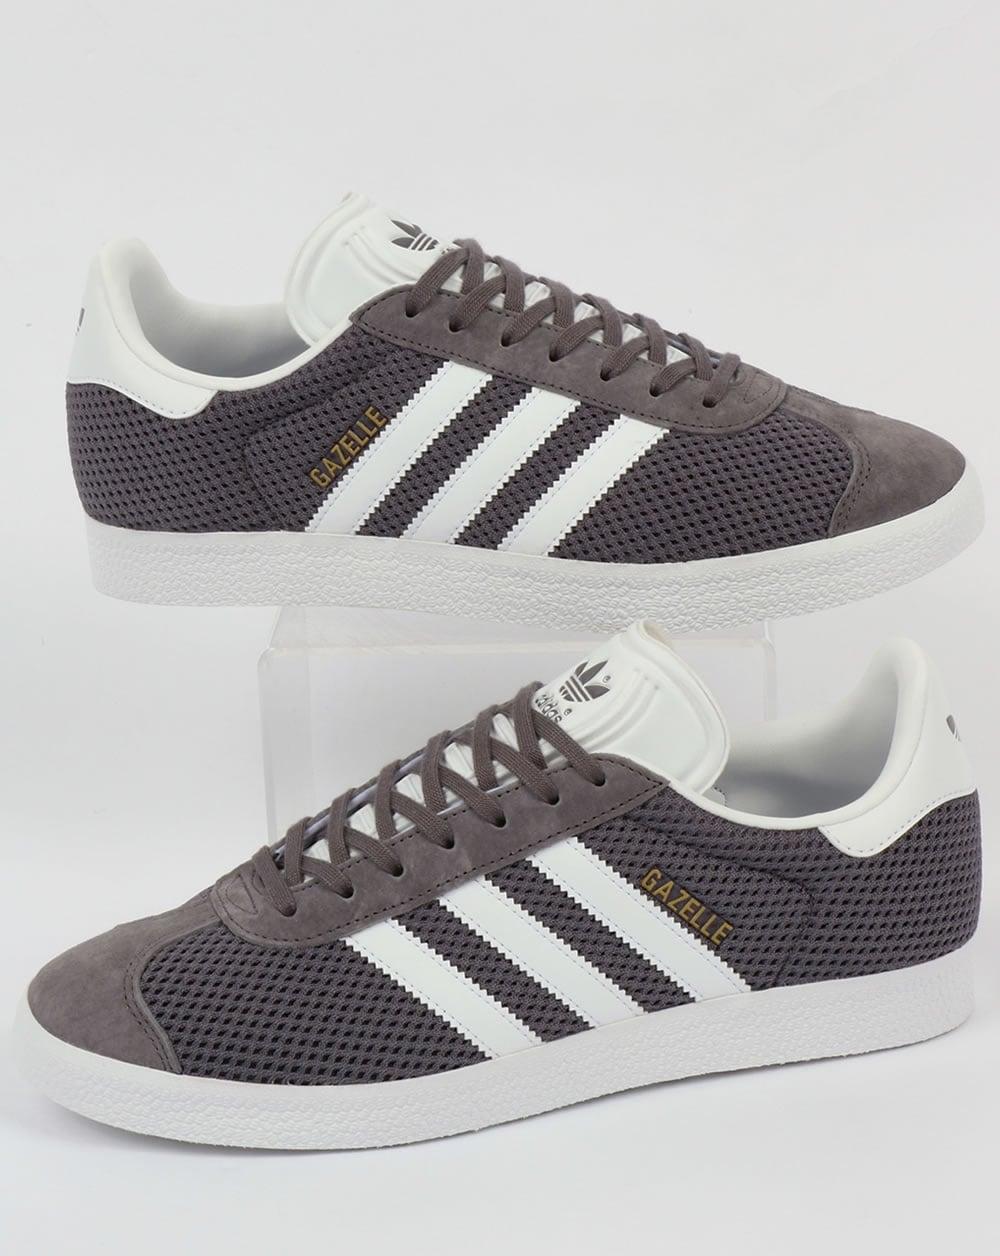 Adidas Gazelle Textile Trainers Trace Grey White Originals